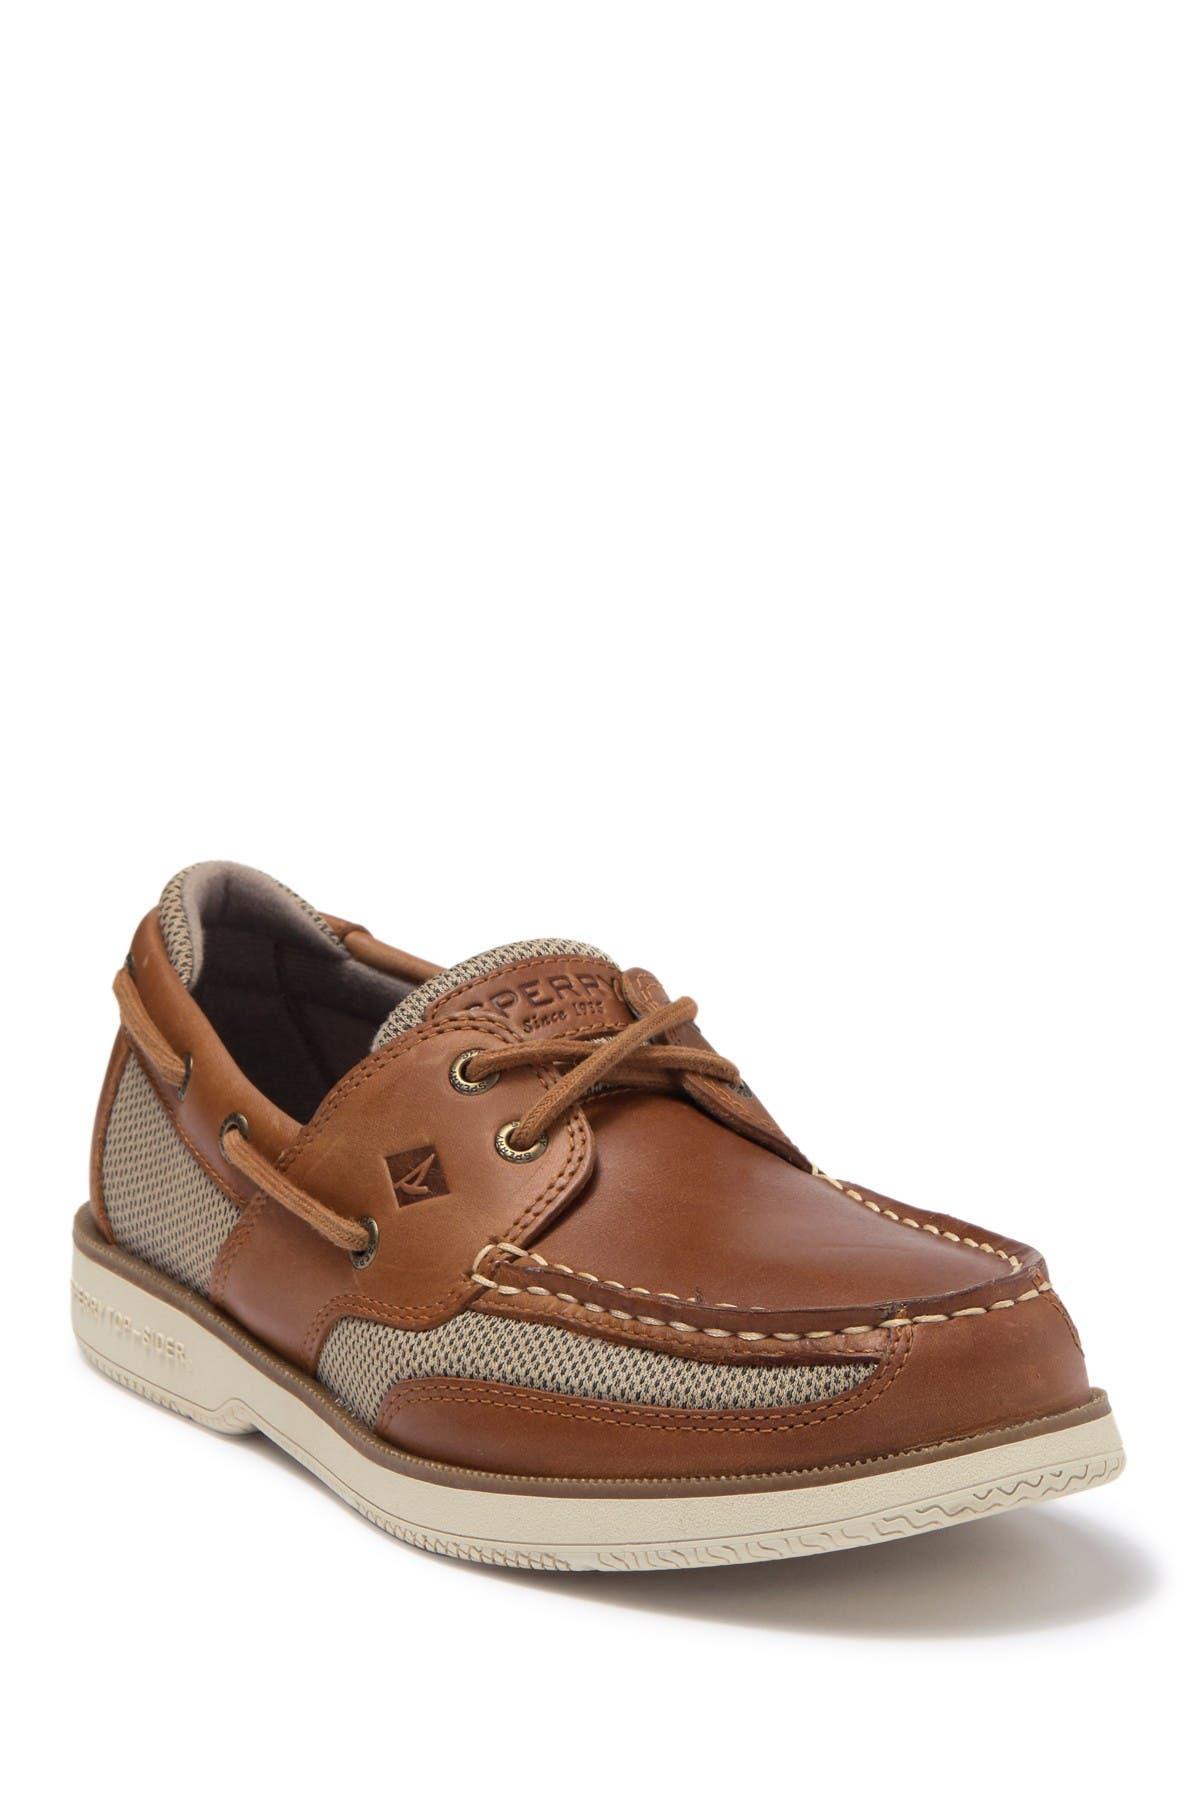 Men's Boat Shoes Clearance | Nordstrom Rack